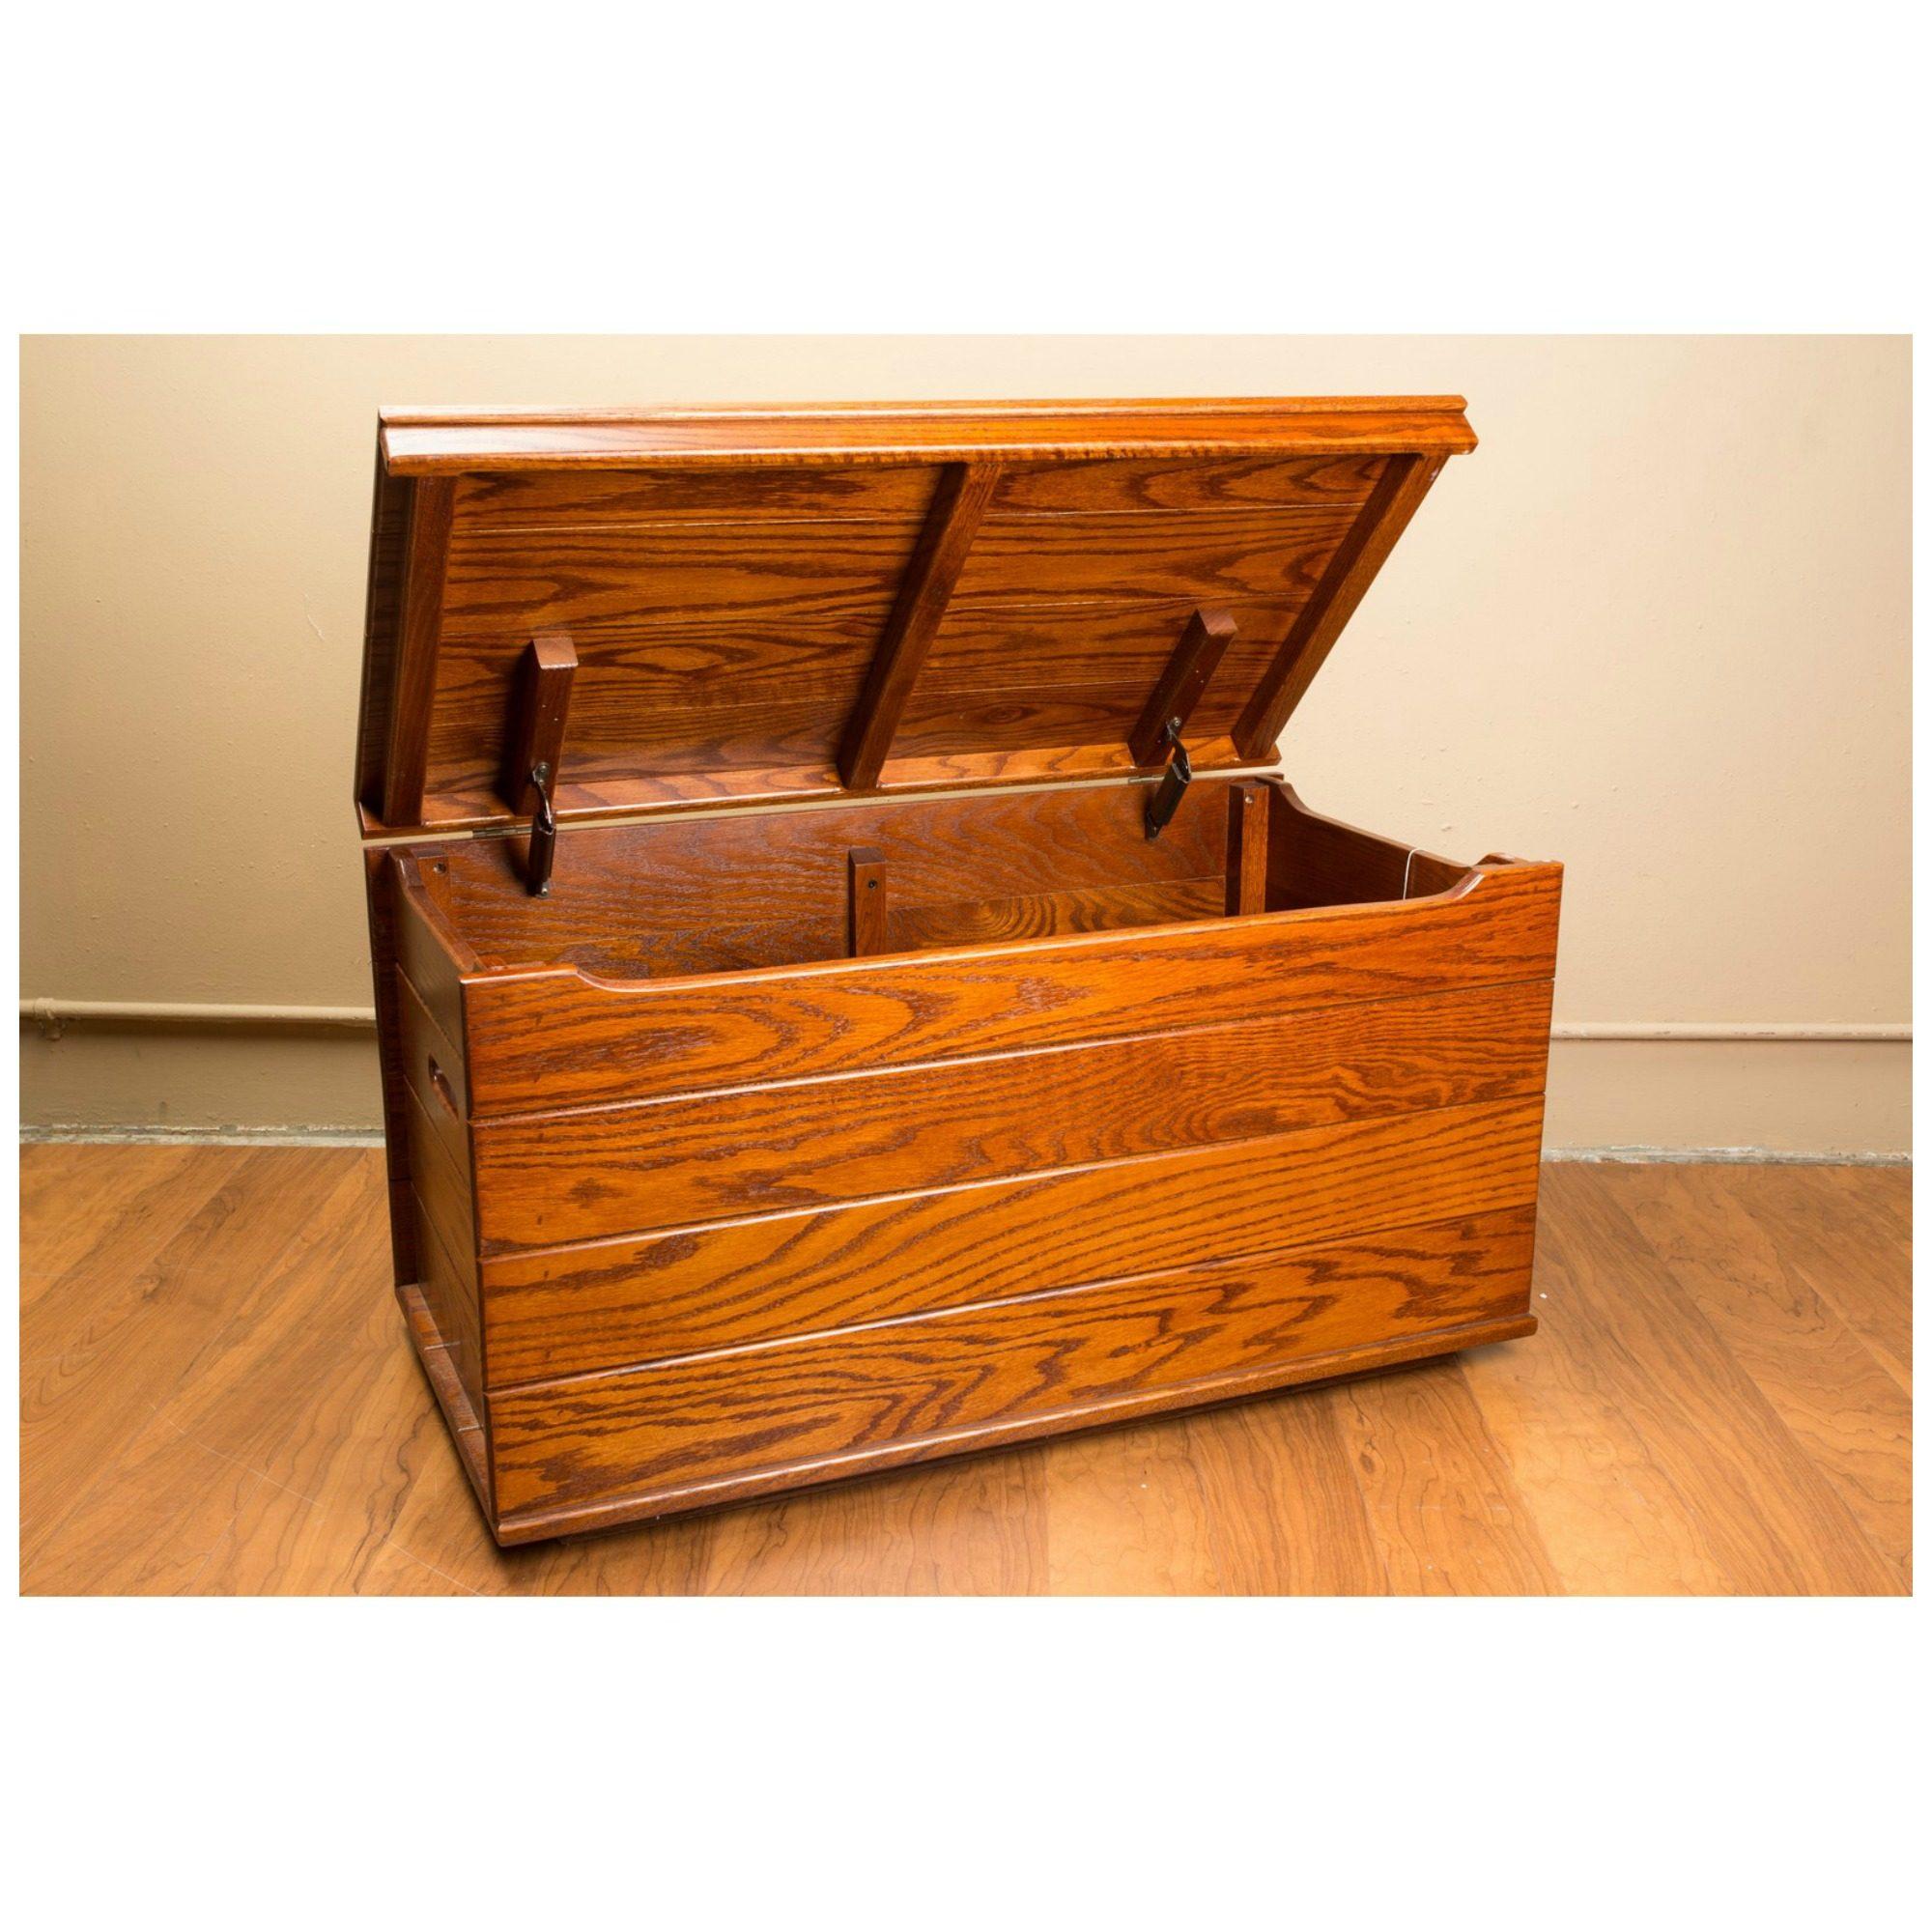 Surprising Creative Wood Design Organizer Chest Andrewgaddart Wooden Chair Designs For Living Room Andrewgaddartcom